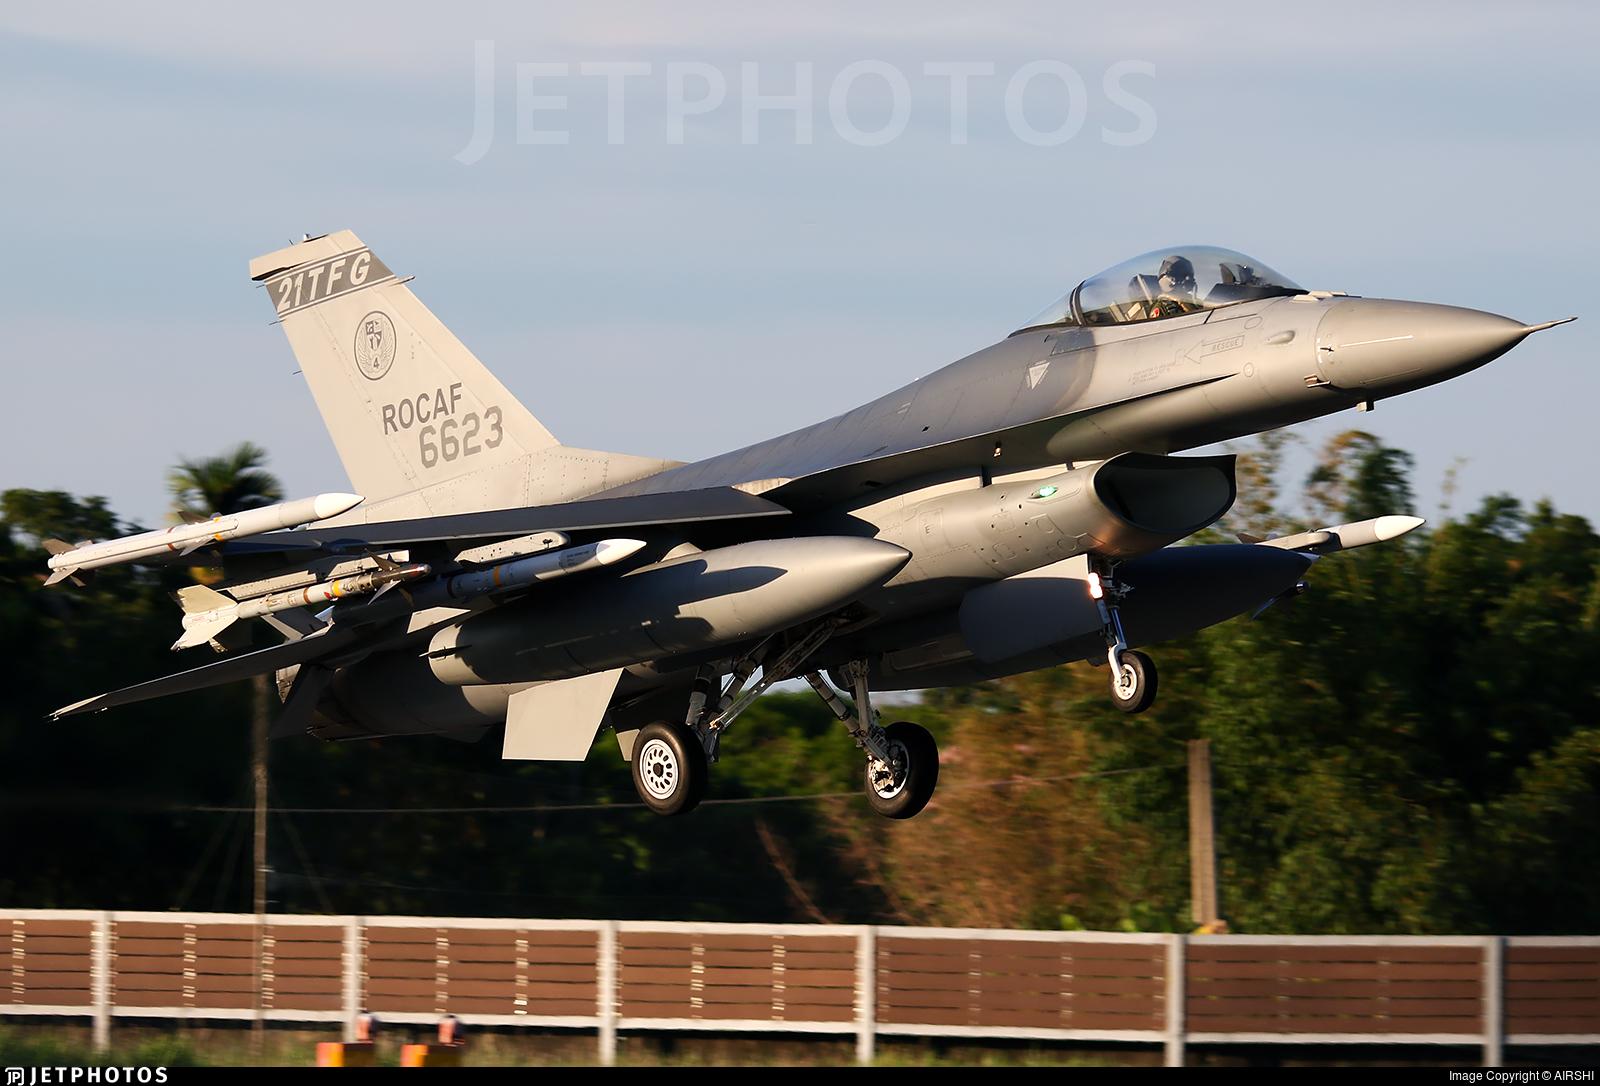 6623 - Lockheed Martin F-16AM Fighting Falcon - Taiwan - Air Force